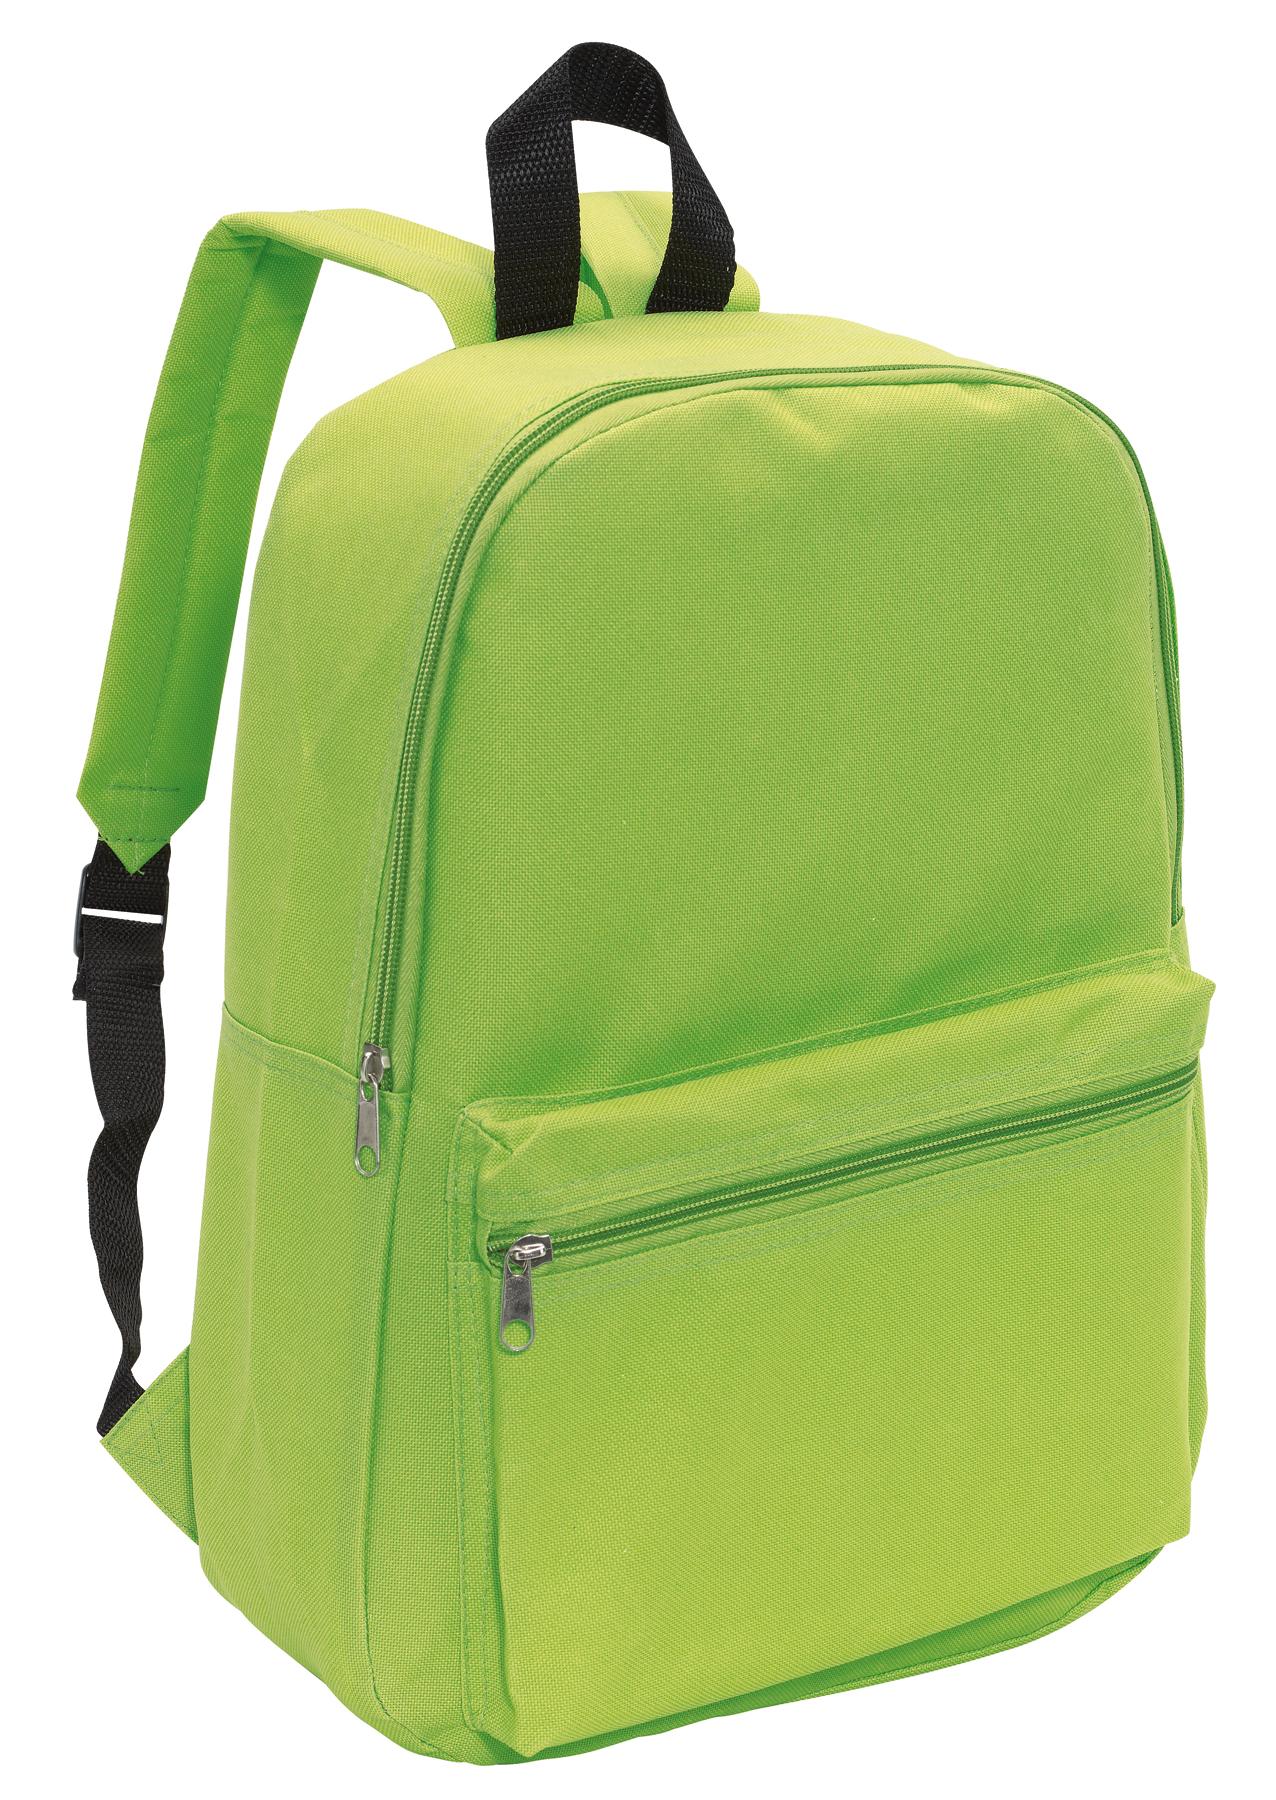 Plecak CHAP, zielone jabłko